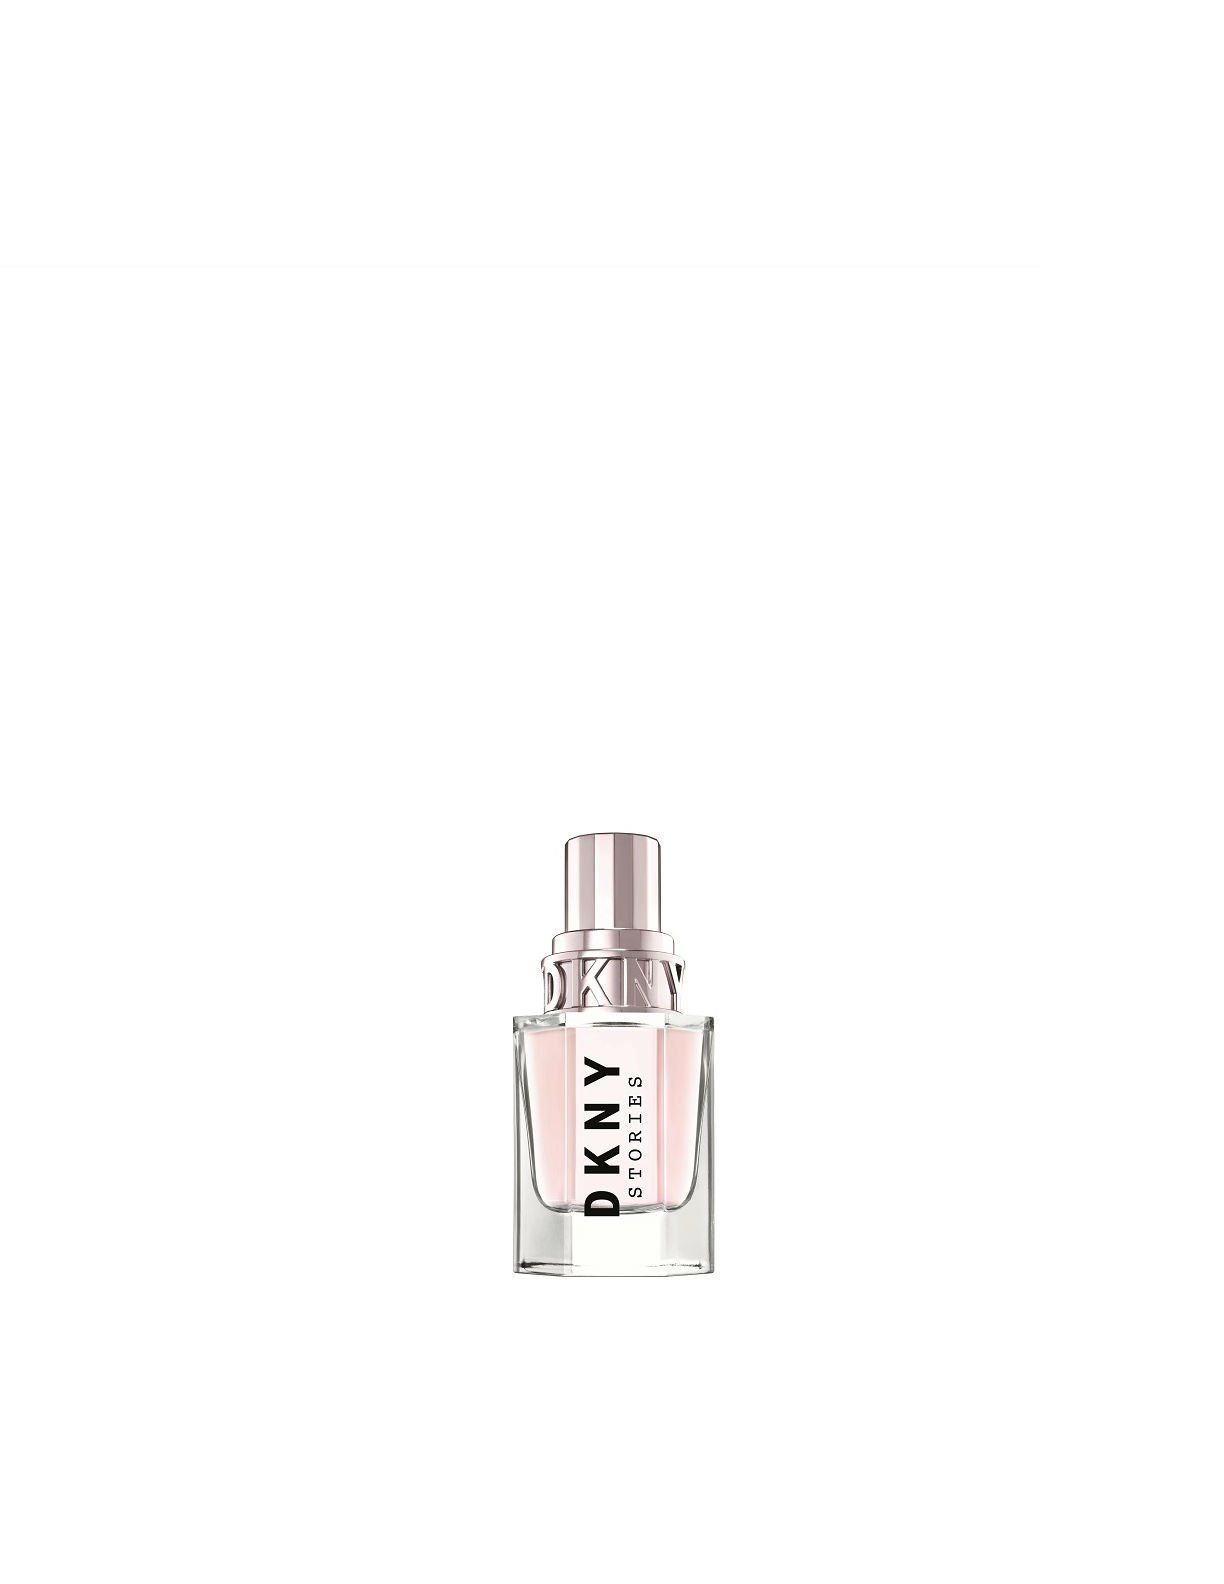 парфюмерная вода Dkny Stories Eau De Parfum Spray 30 Ml